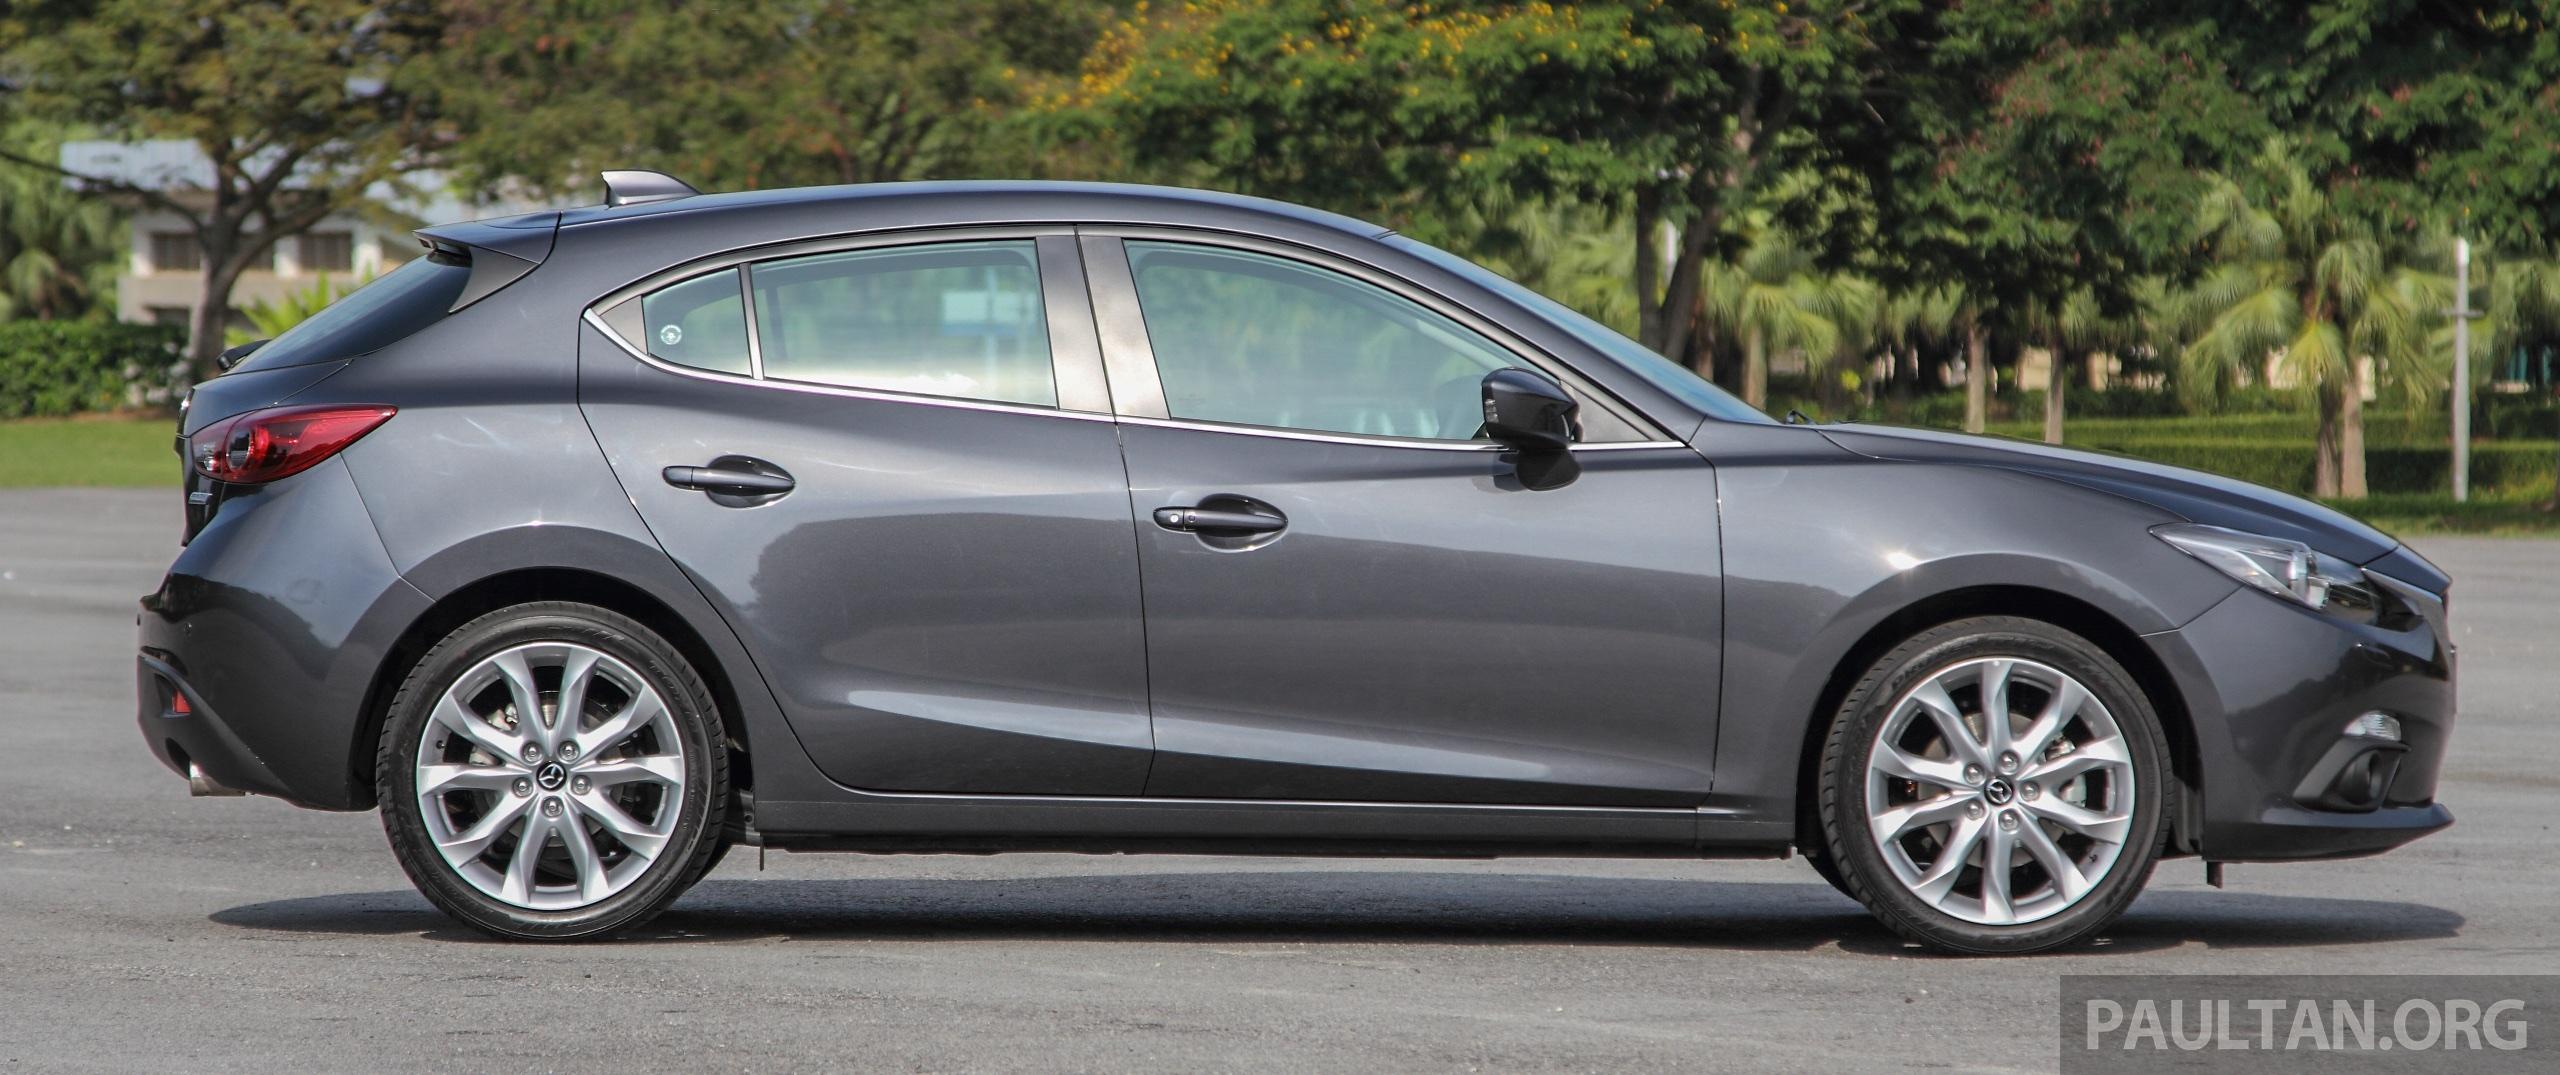 Mazda 3 Hatch >> 下周举办促销活动,发布特仕版Mazdasports Mazda 3。 2015_mazda_3_ckd_hatch_malaysia_-014 - Paul Tan 汽车资讯网